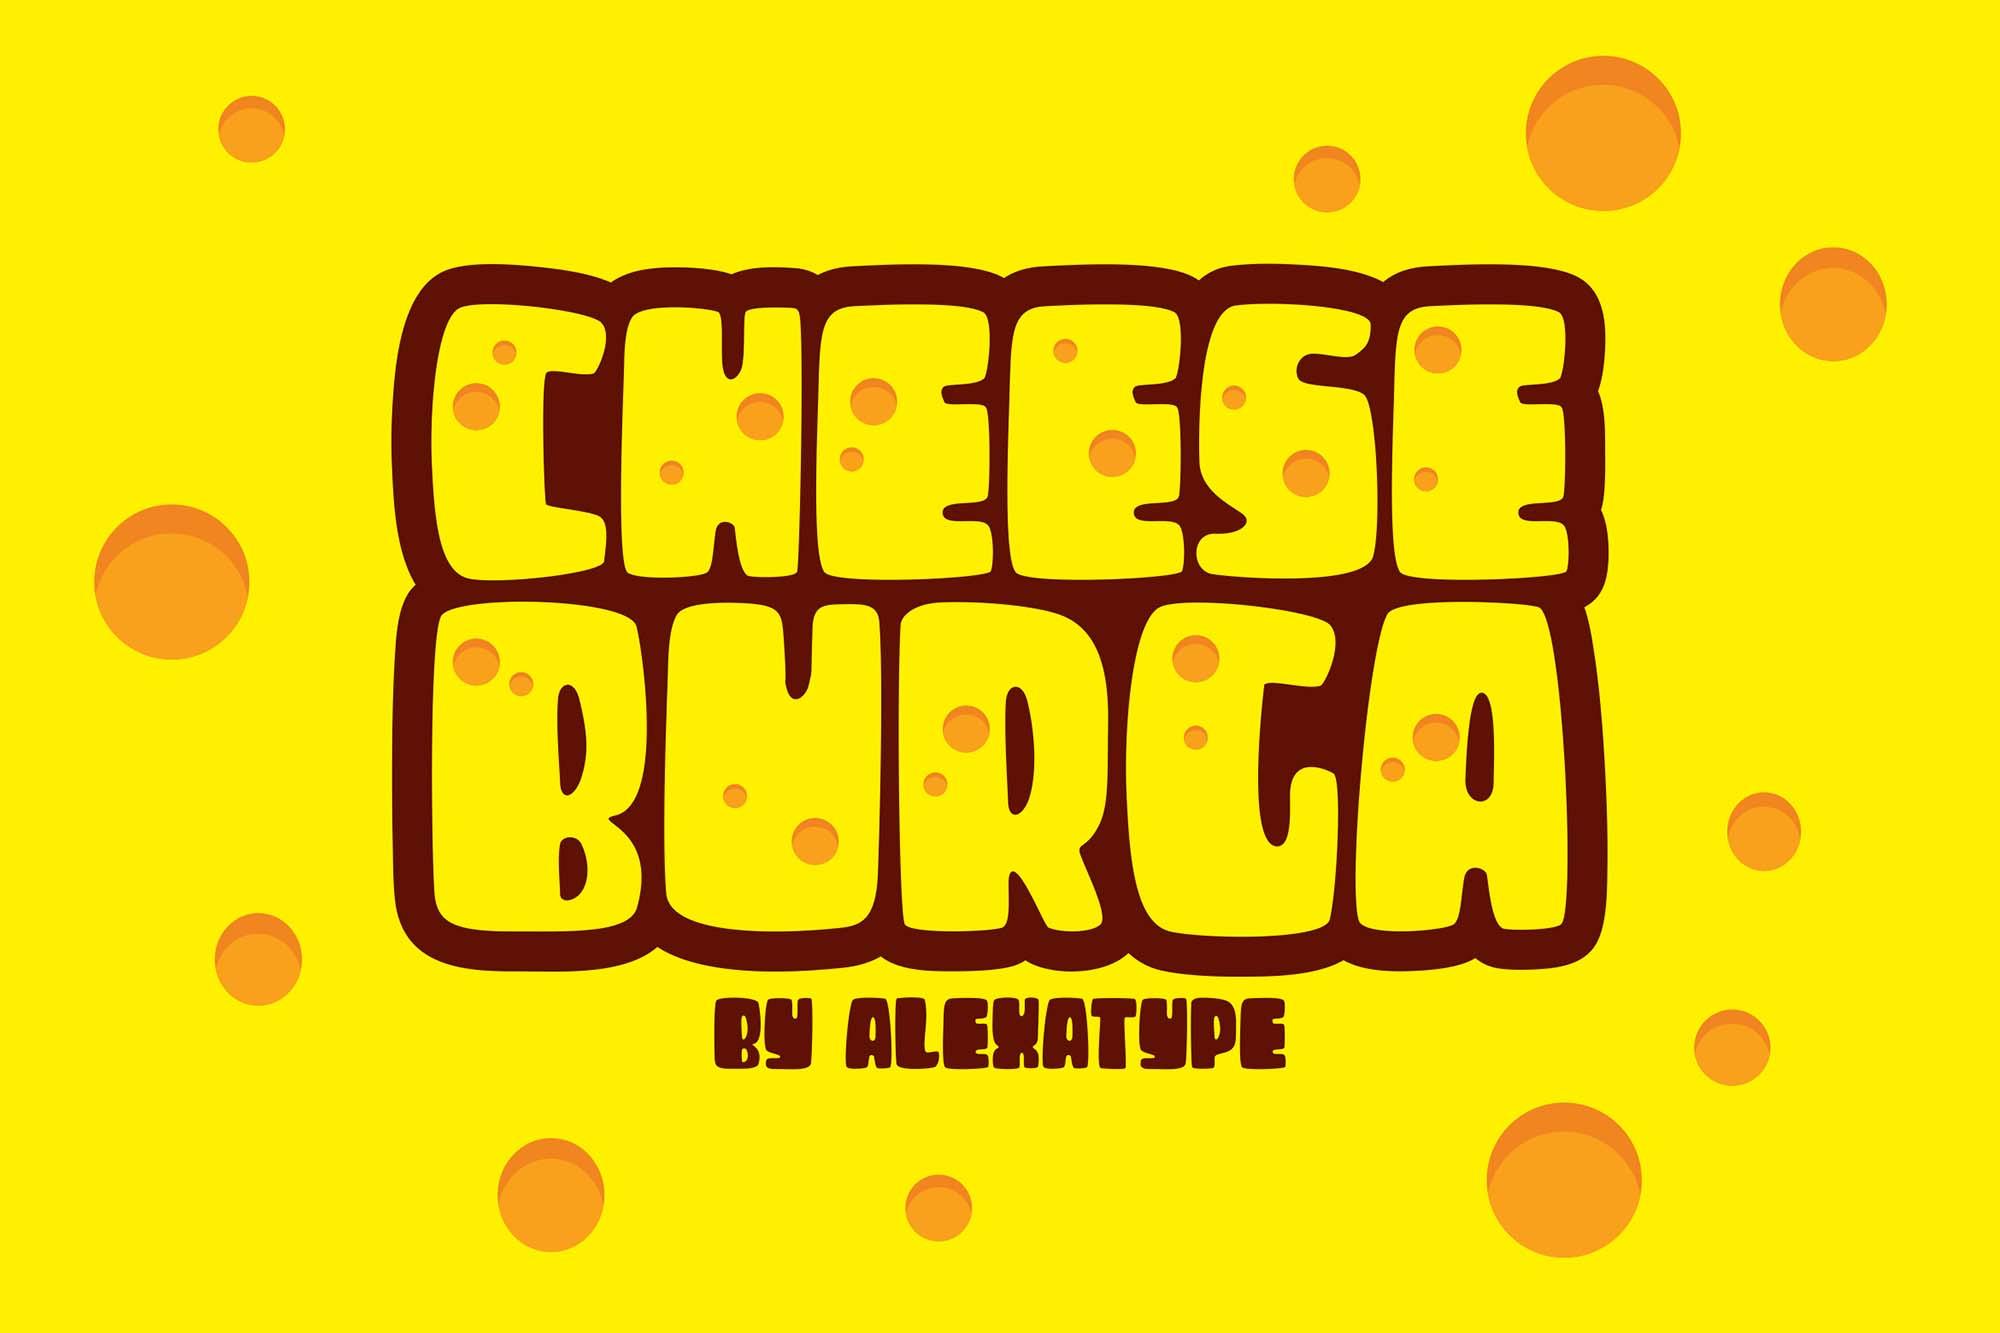 CheeseBurga Chubby Cute Font